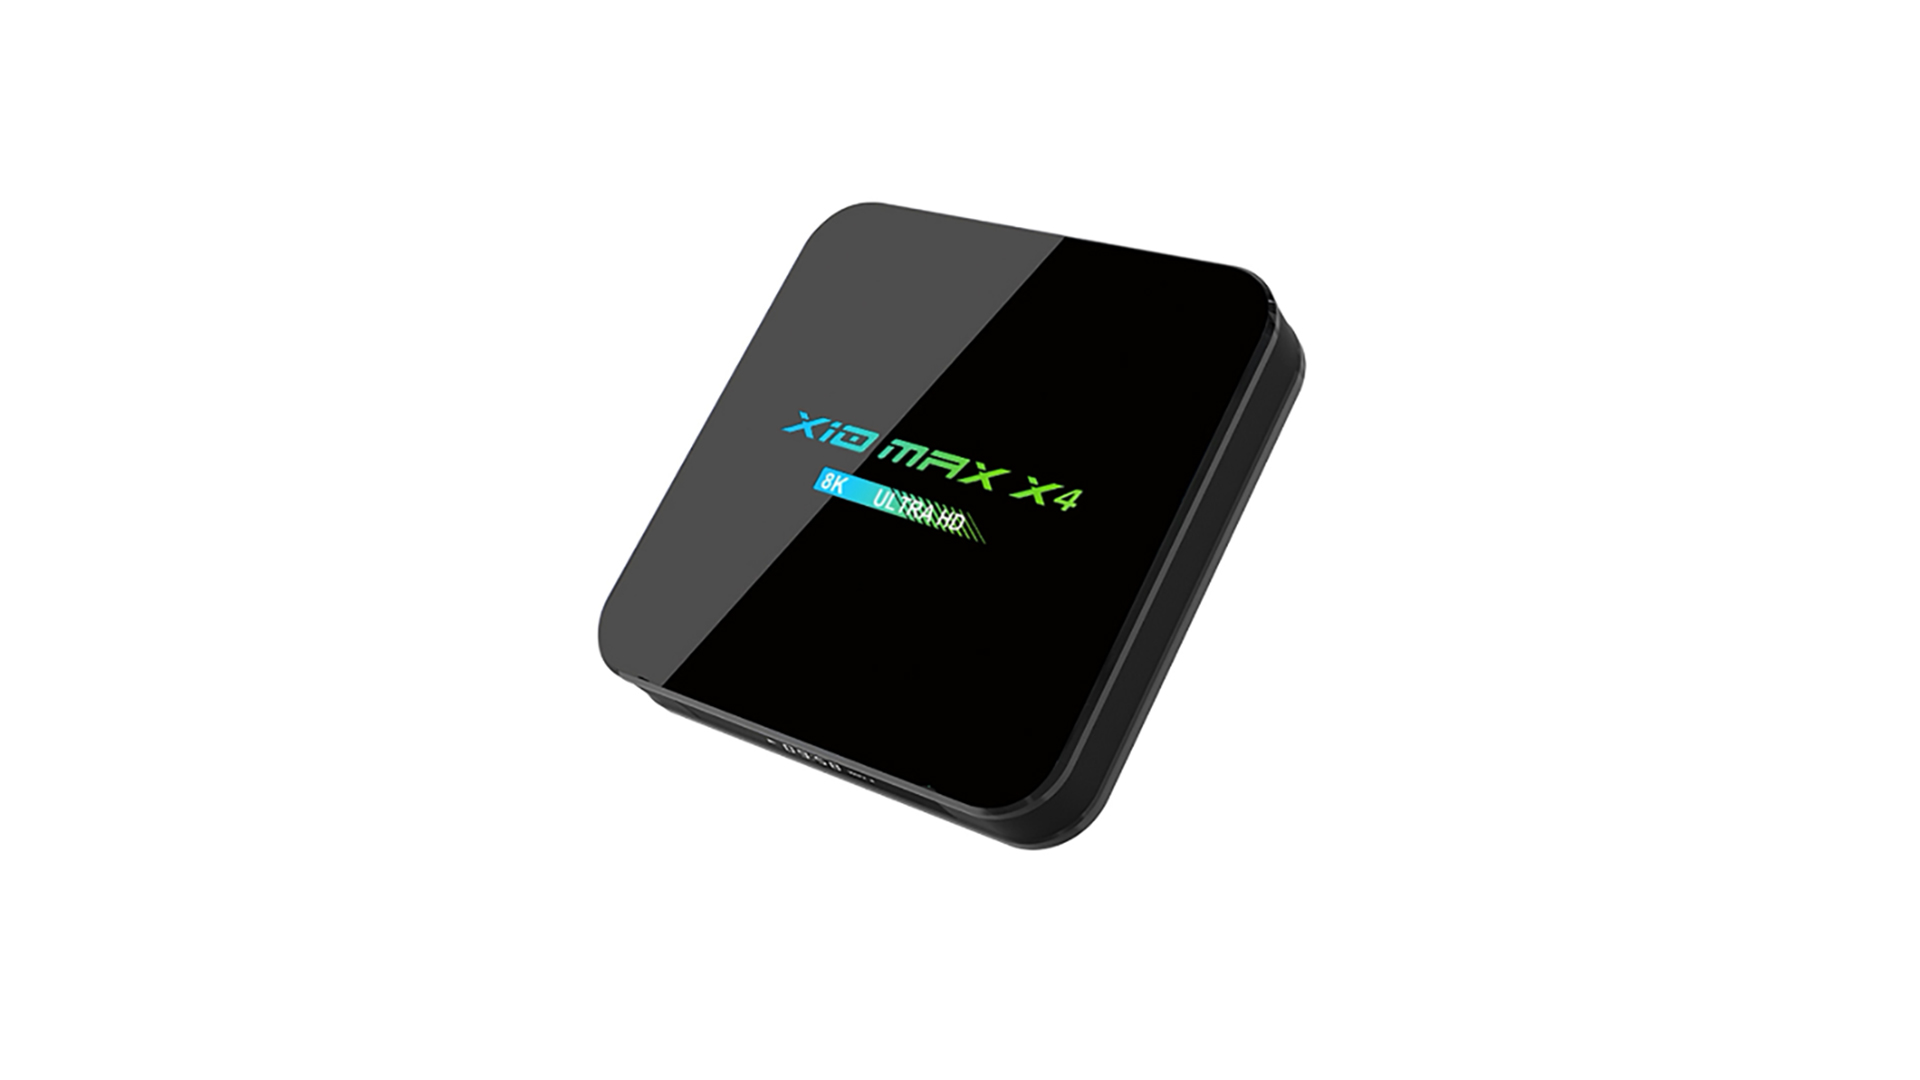 Utocin Customized X10 Max X4 Amlogic S905X4 8K TV box android 11 os ram 2GB 4GB rom 16GB 32GB dual wifi with bluetooth manufacturers FromChina